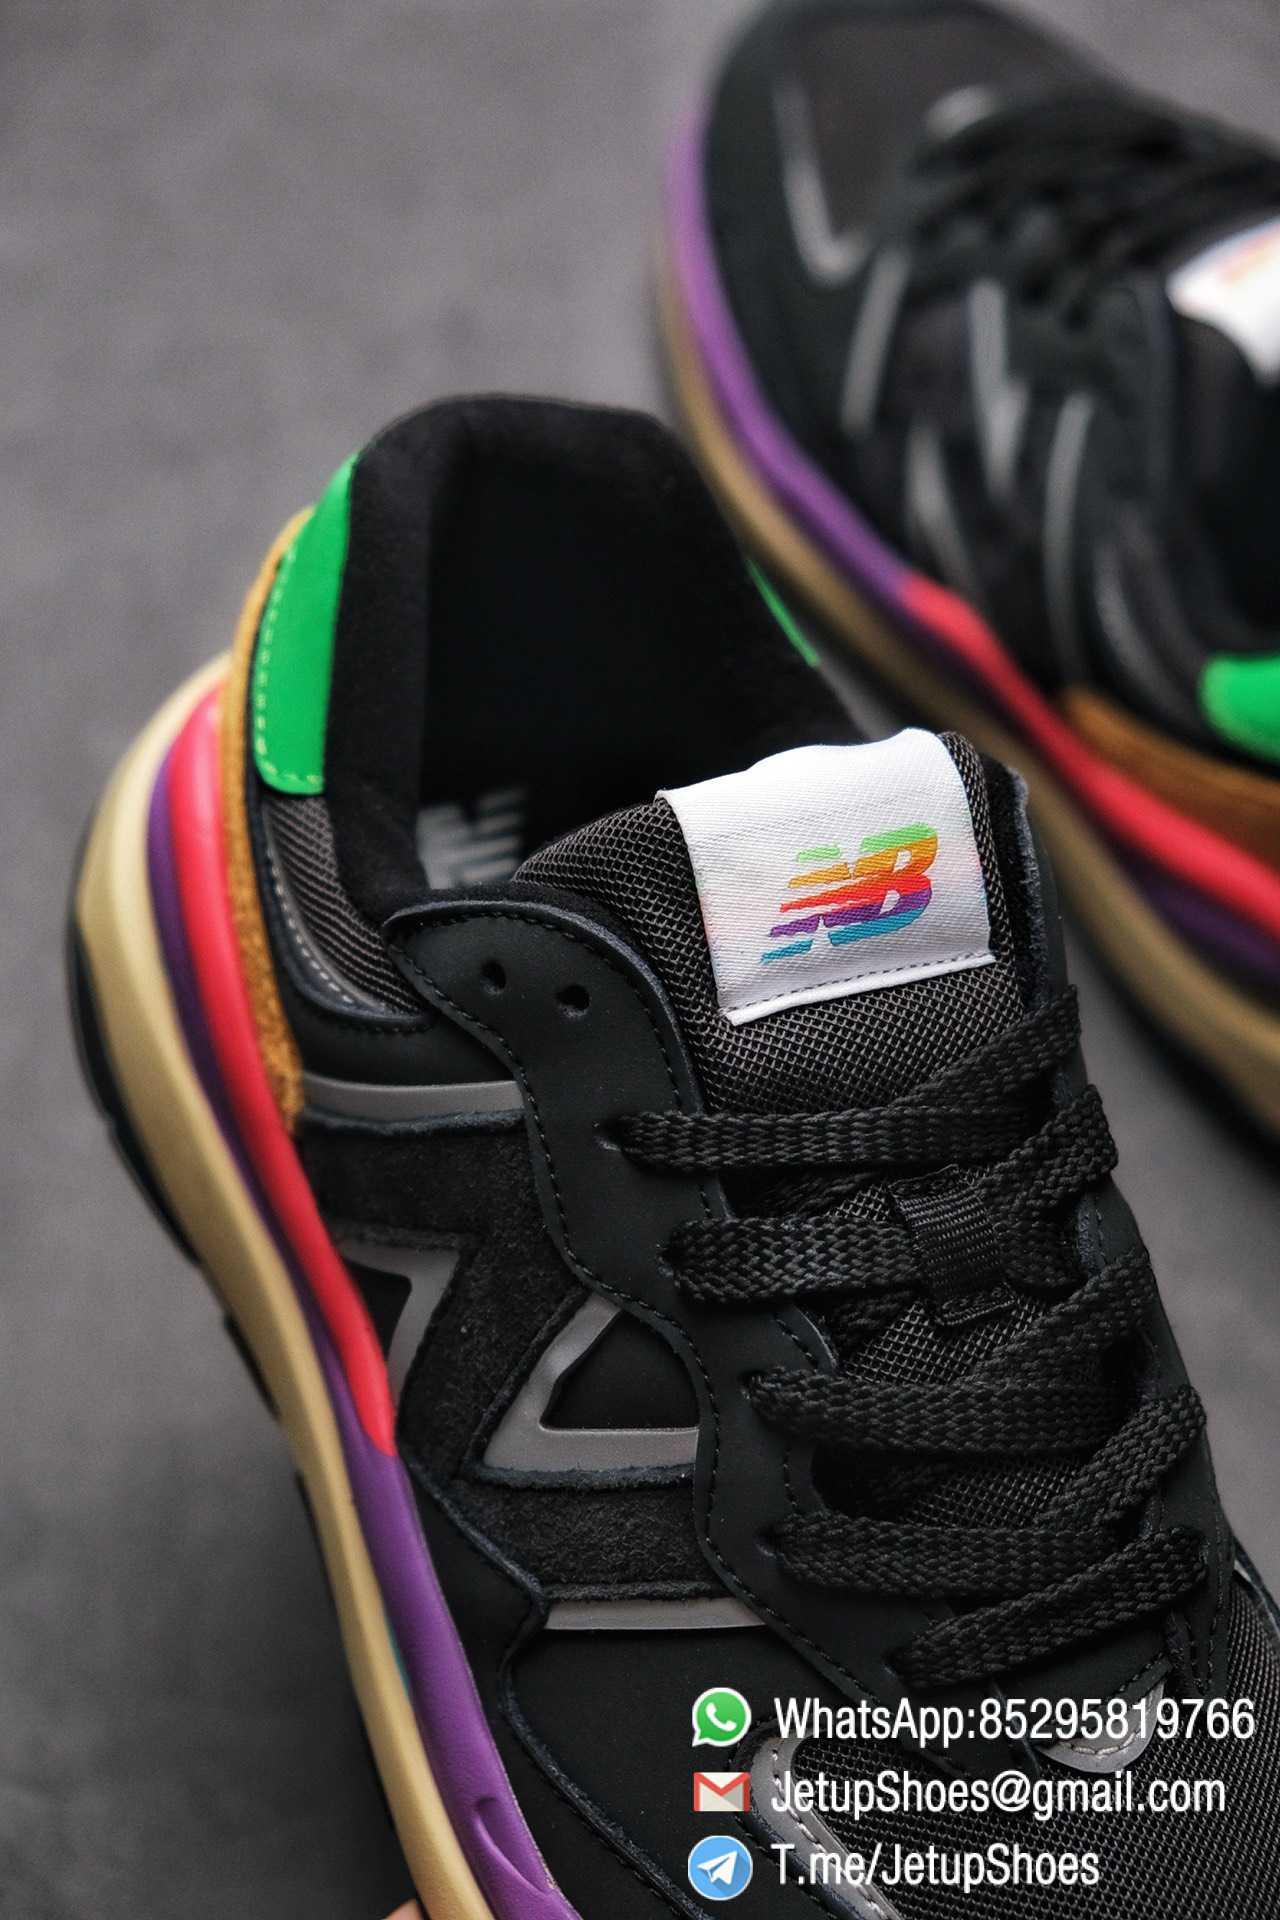 New Balance 5740 Black Multicolor Running Sneakers M5740LB Black Mesh Upper Oriange Suede Oversized N 05